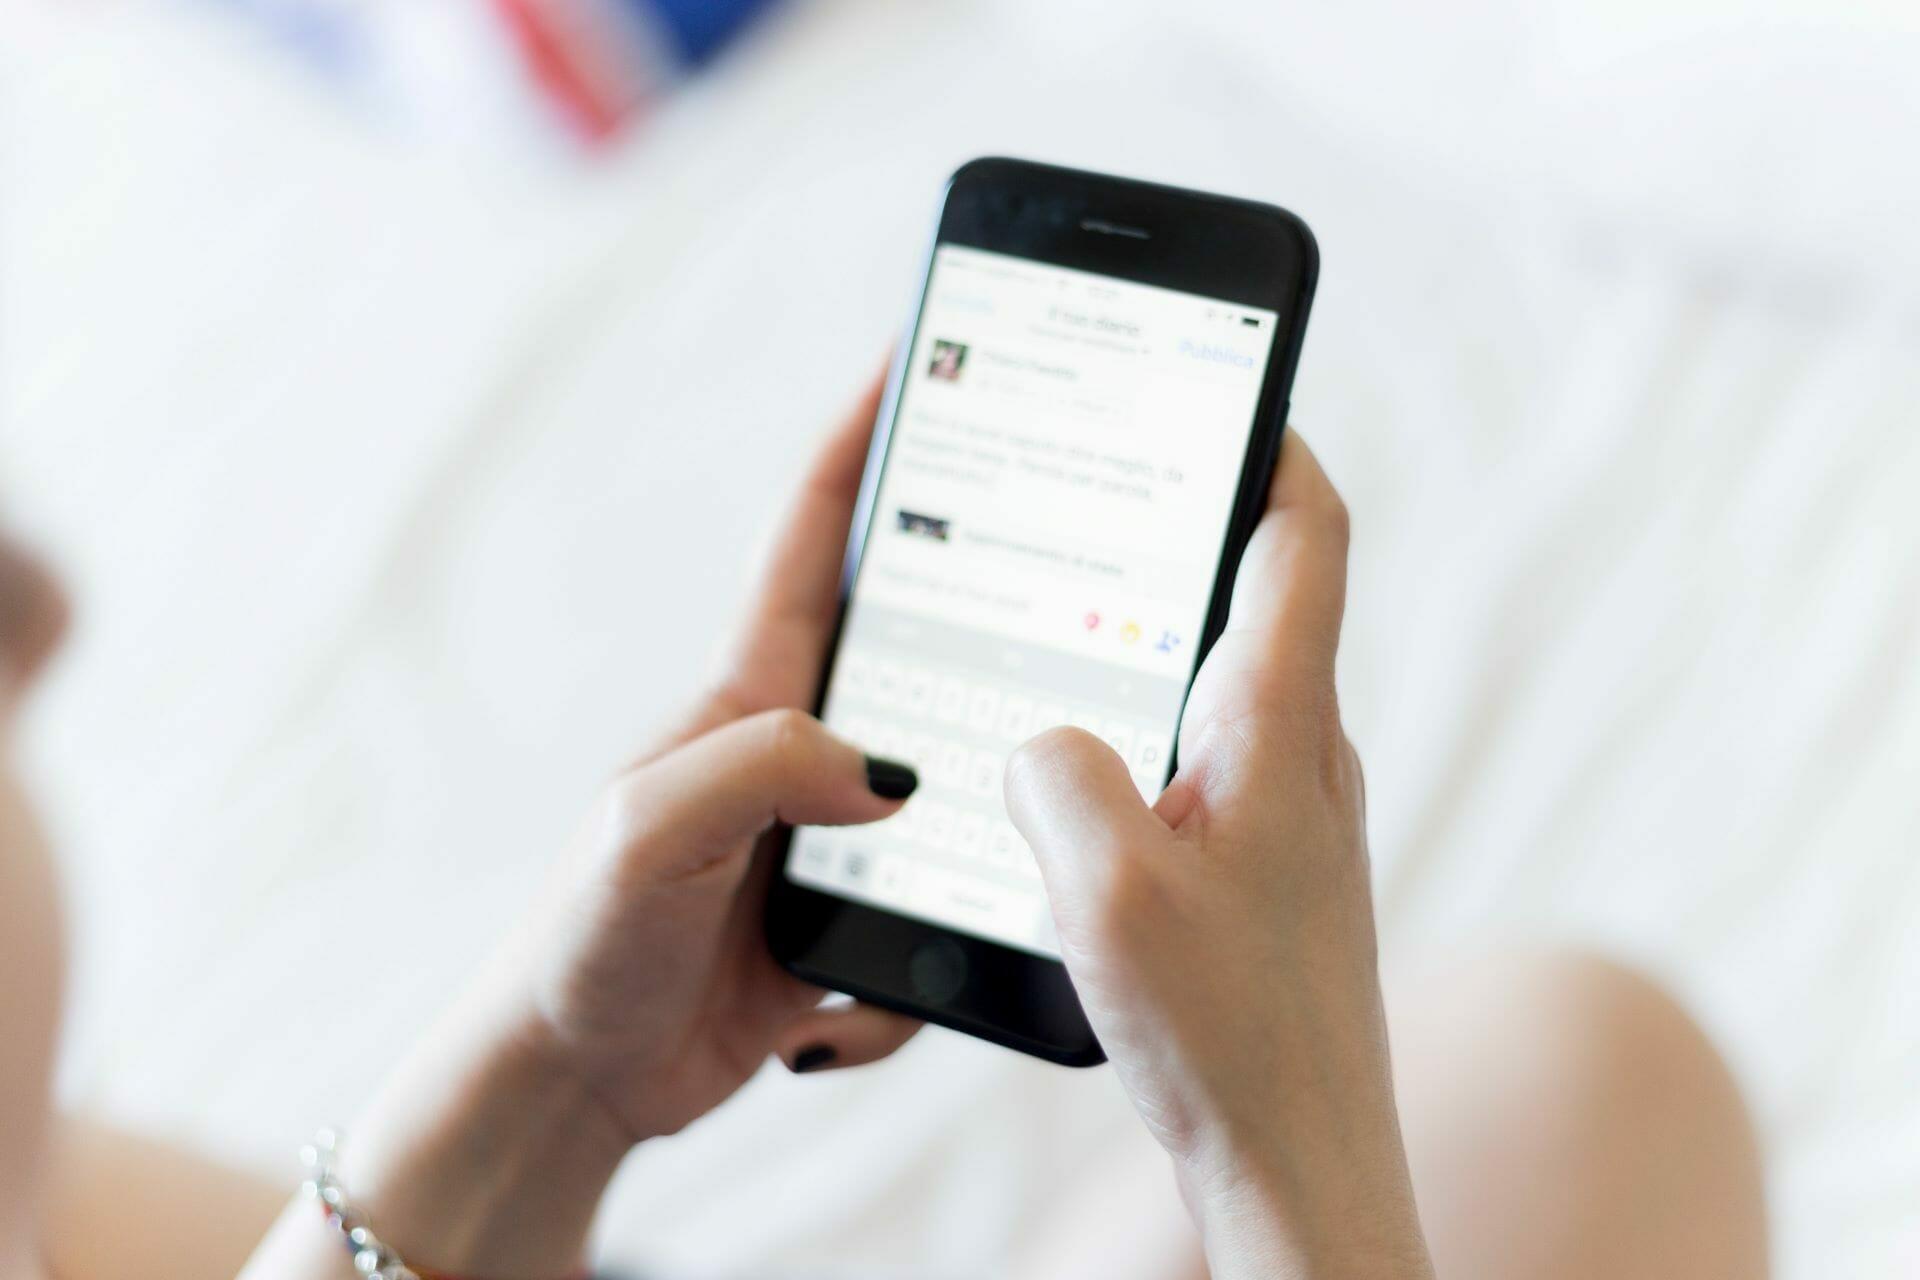 How to Quit a Job Over the Phone: 6 Easy Steps via @allamericanatlas